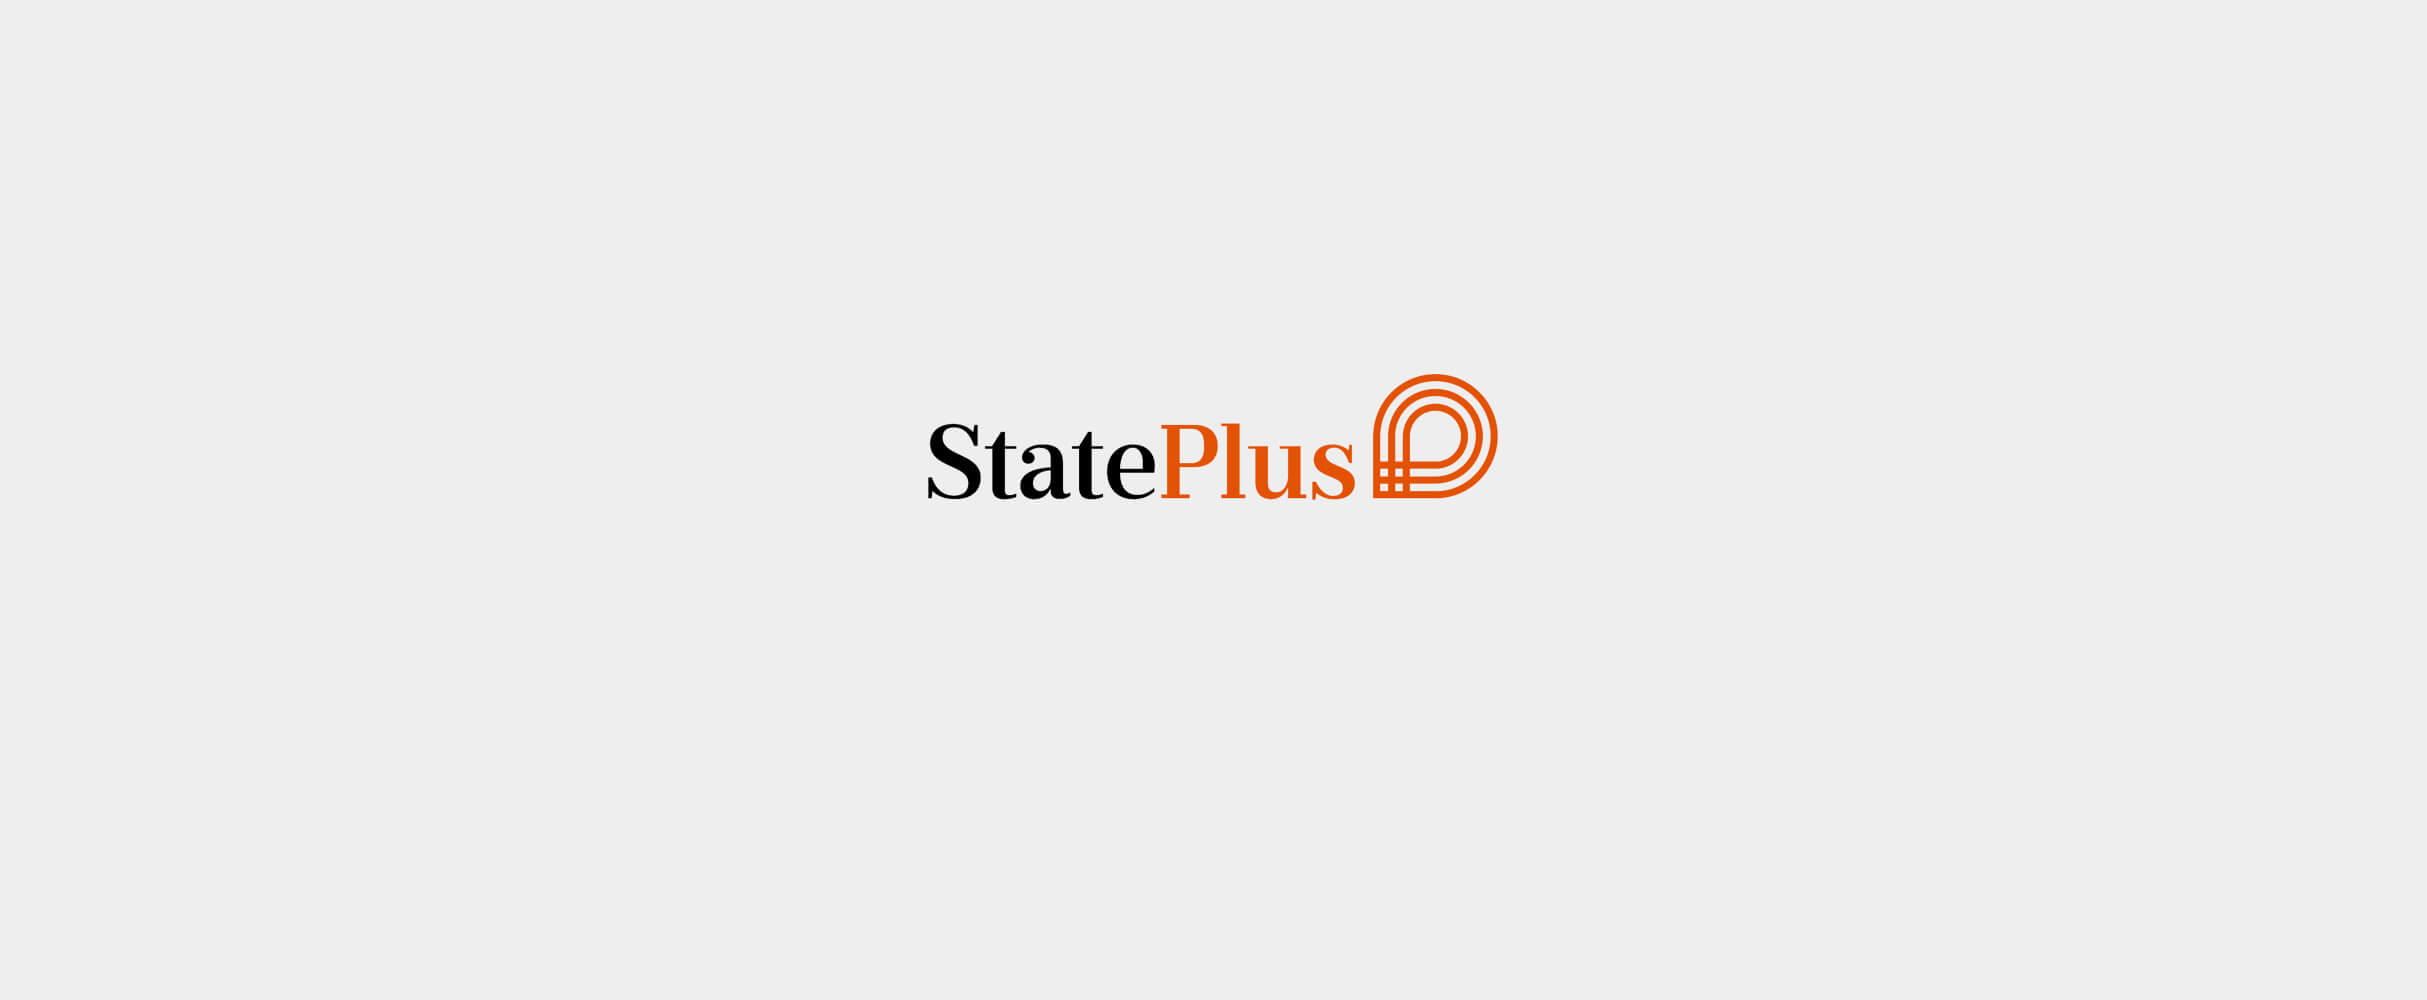 StatePlus